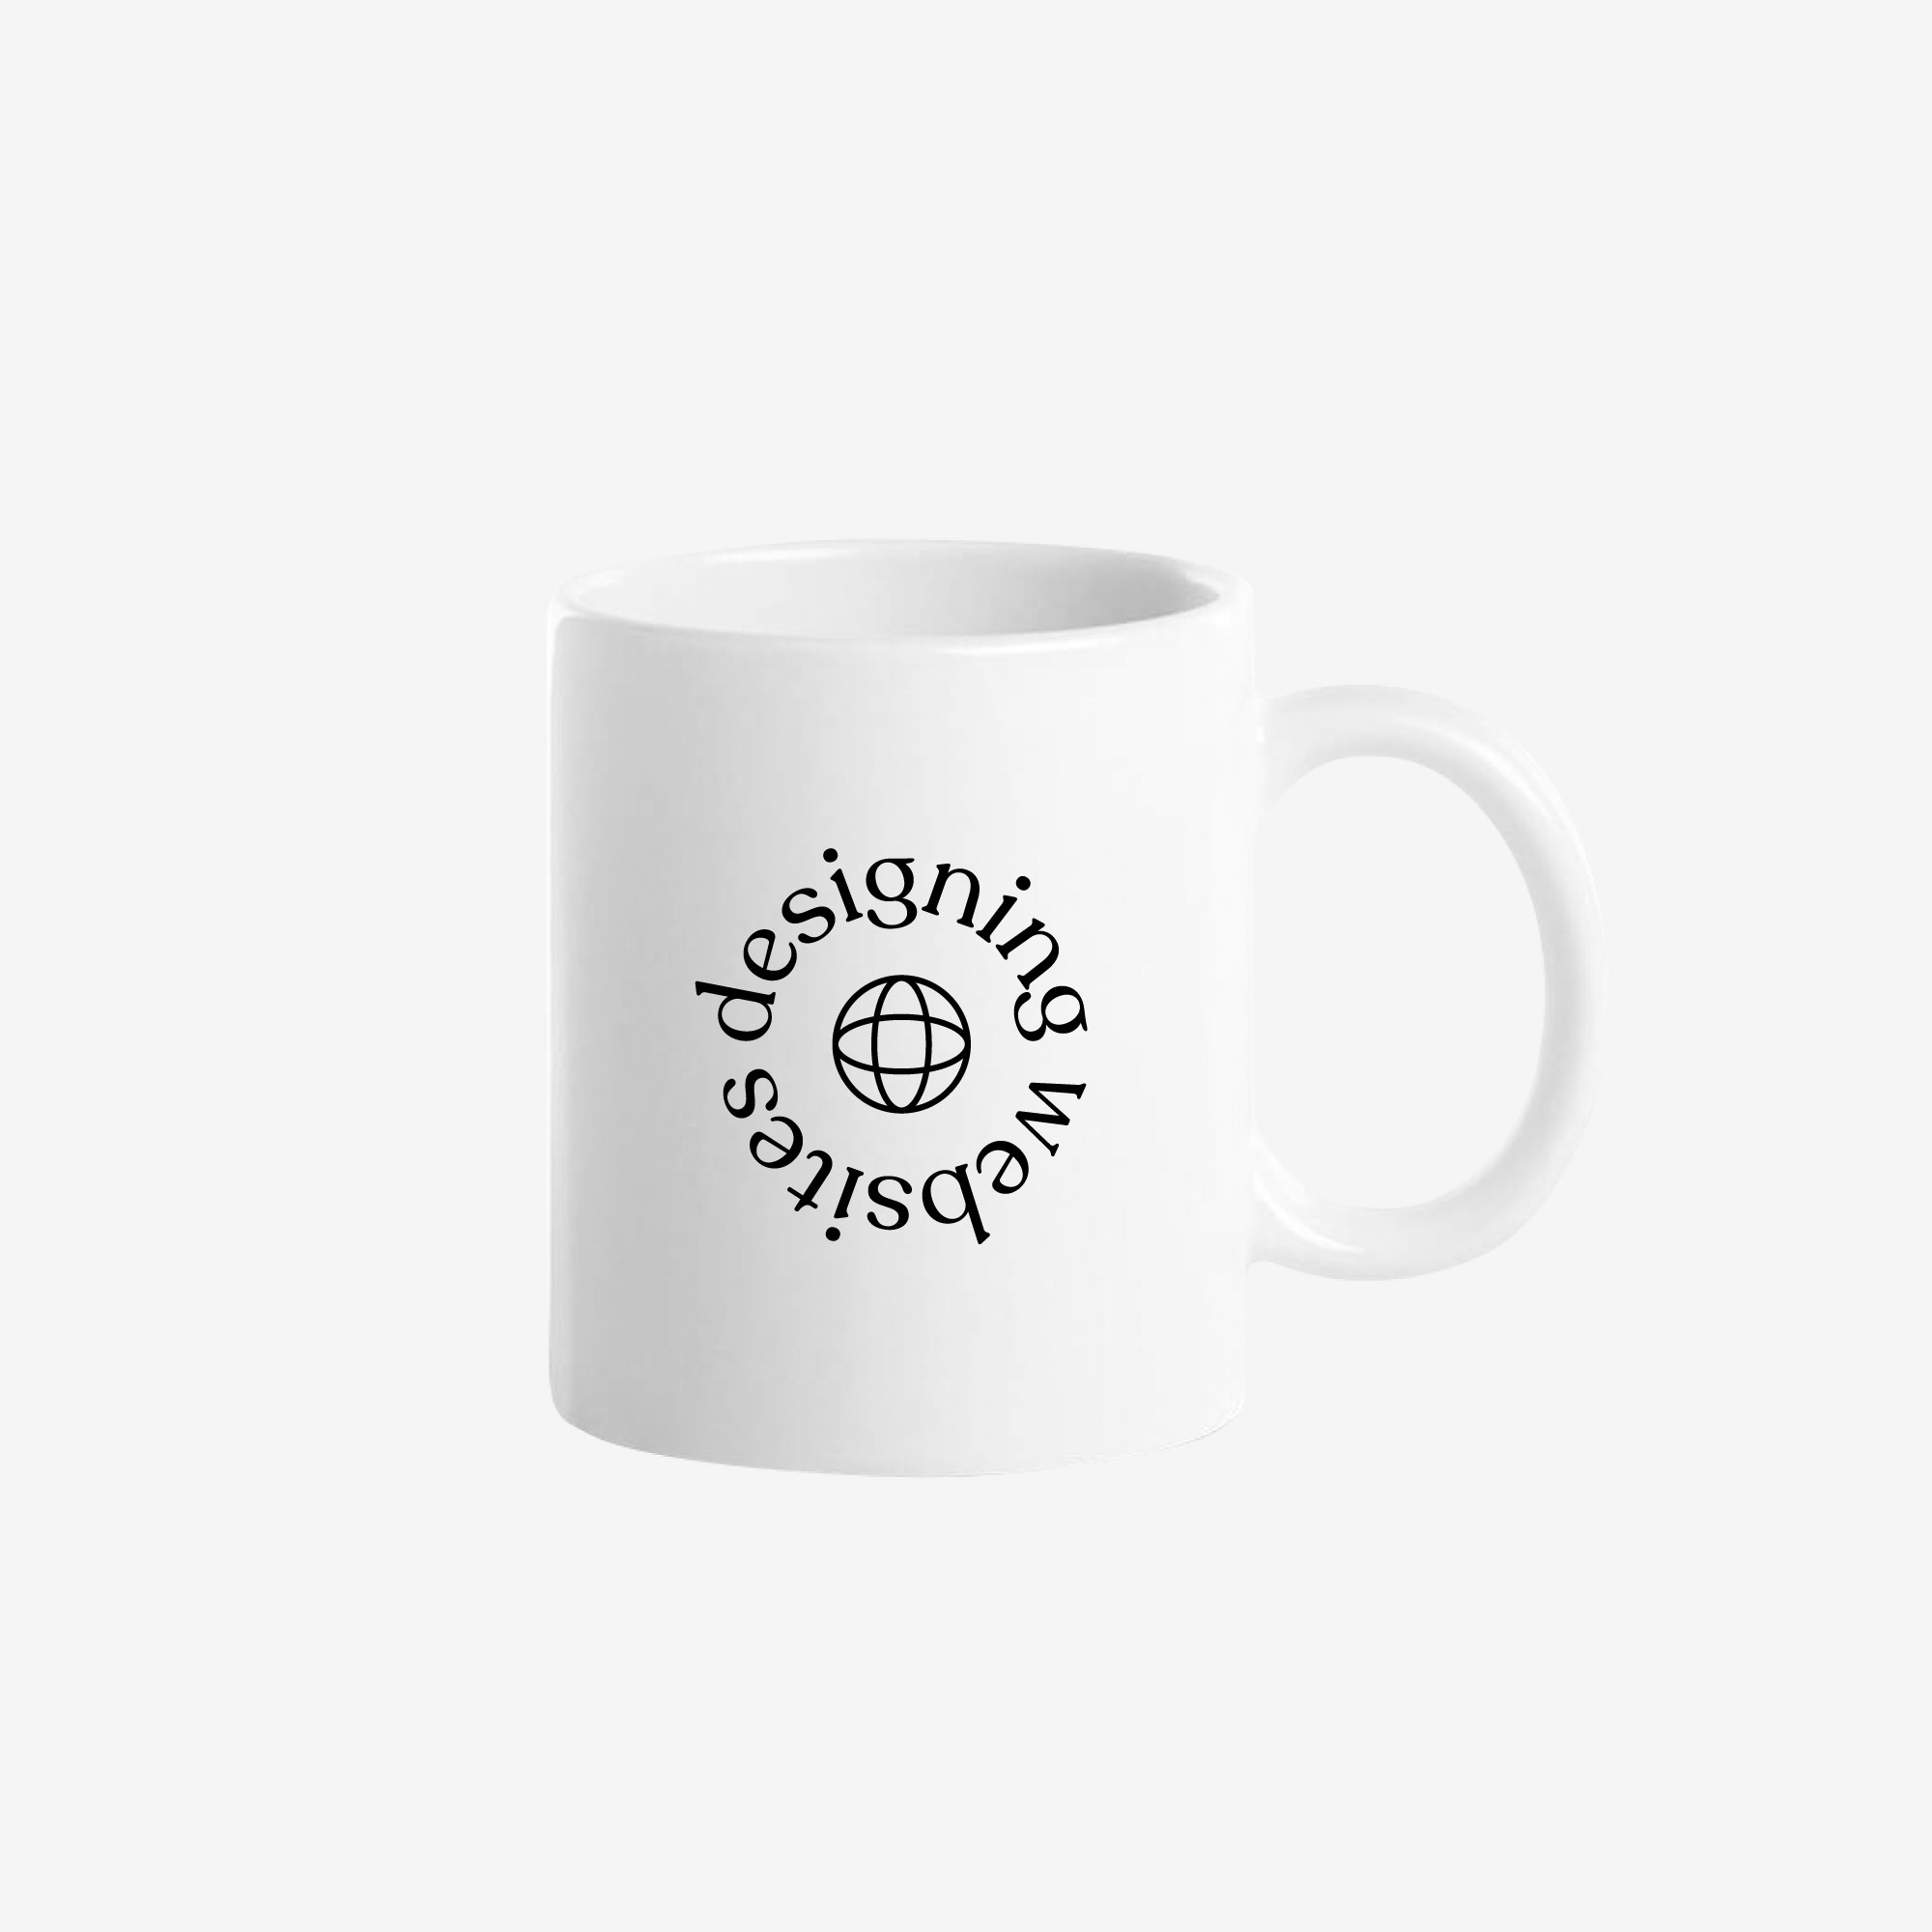 "A white ceramic coffee mug with a circular text design saying ""designing websites"" around a minimal globe line illustration."